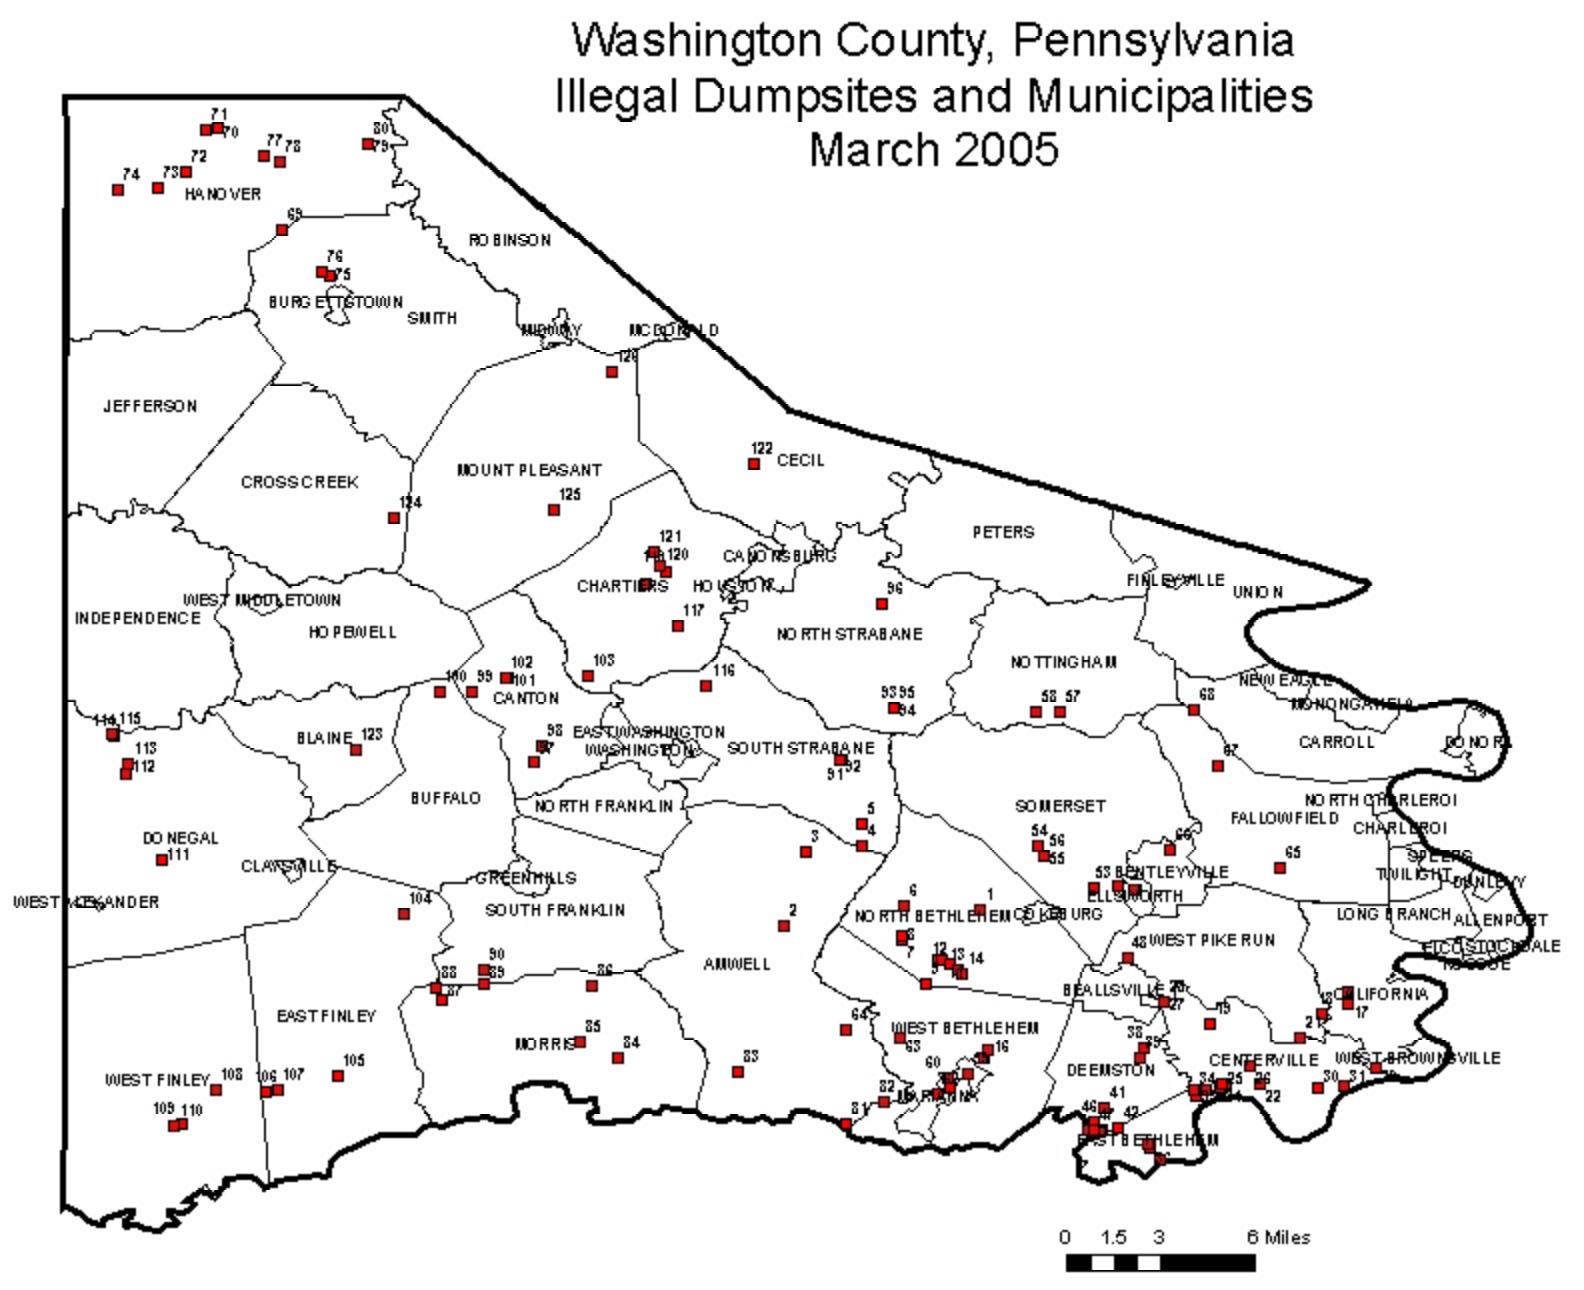 Pa Environment Digest Blog Keep Pa Beautiful Washington County Court Partner To Remove 330 435